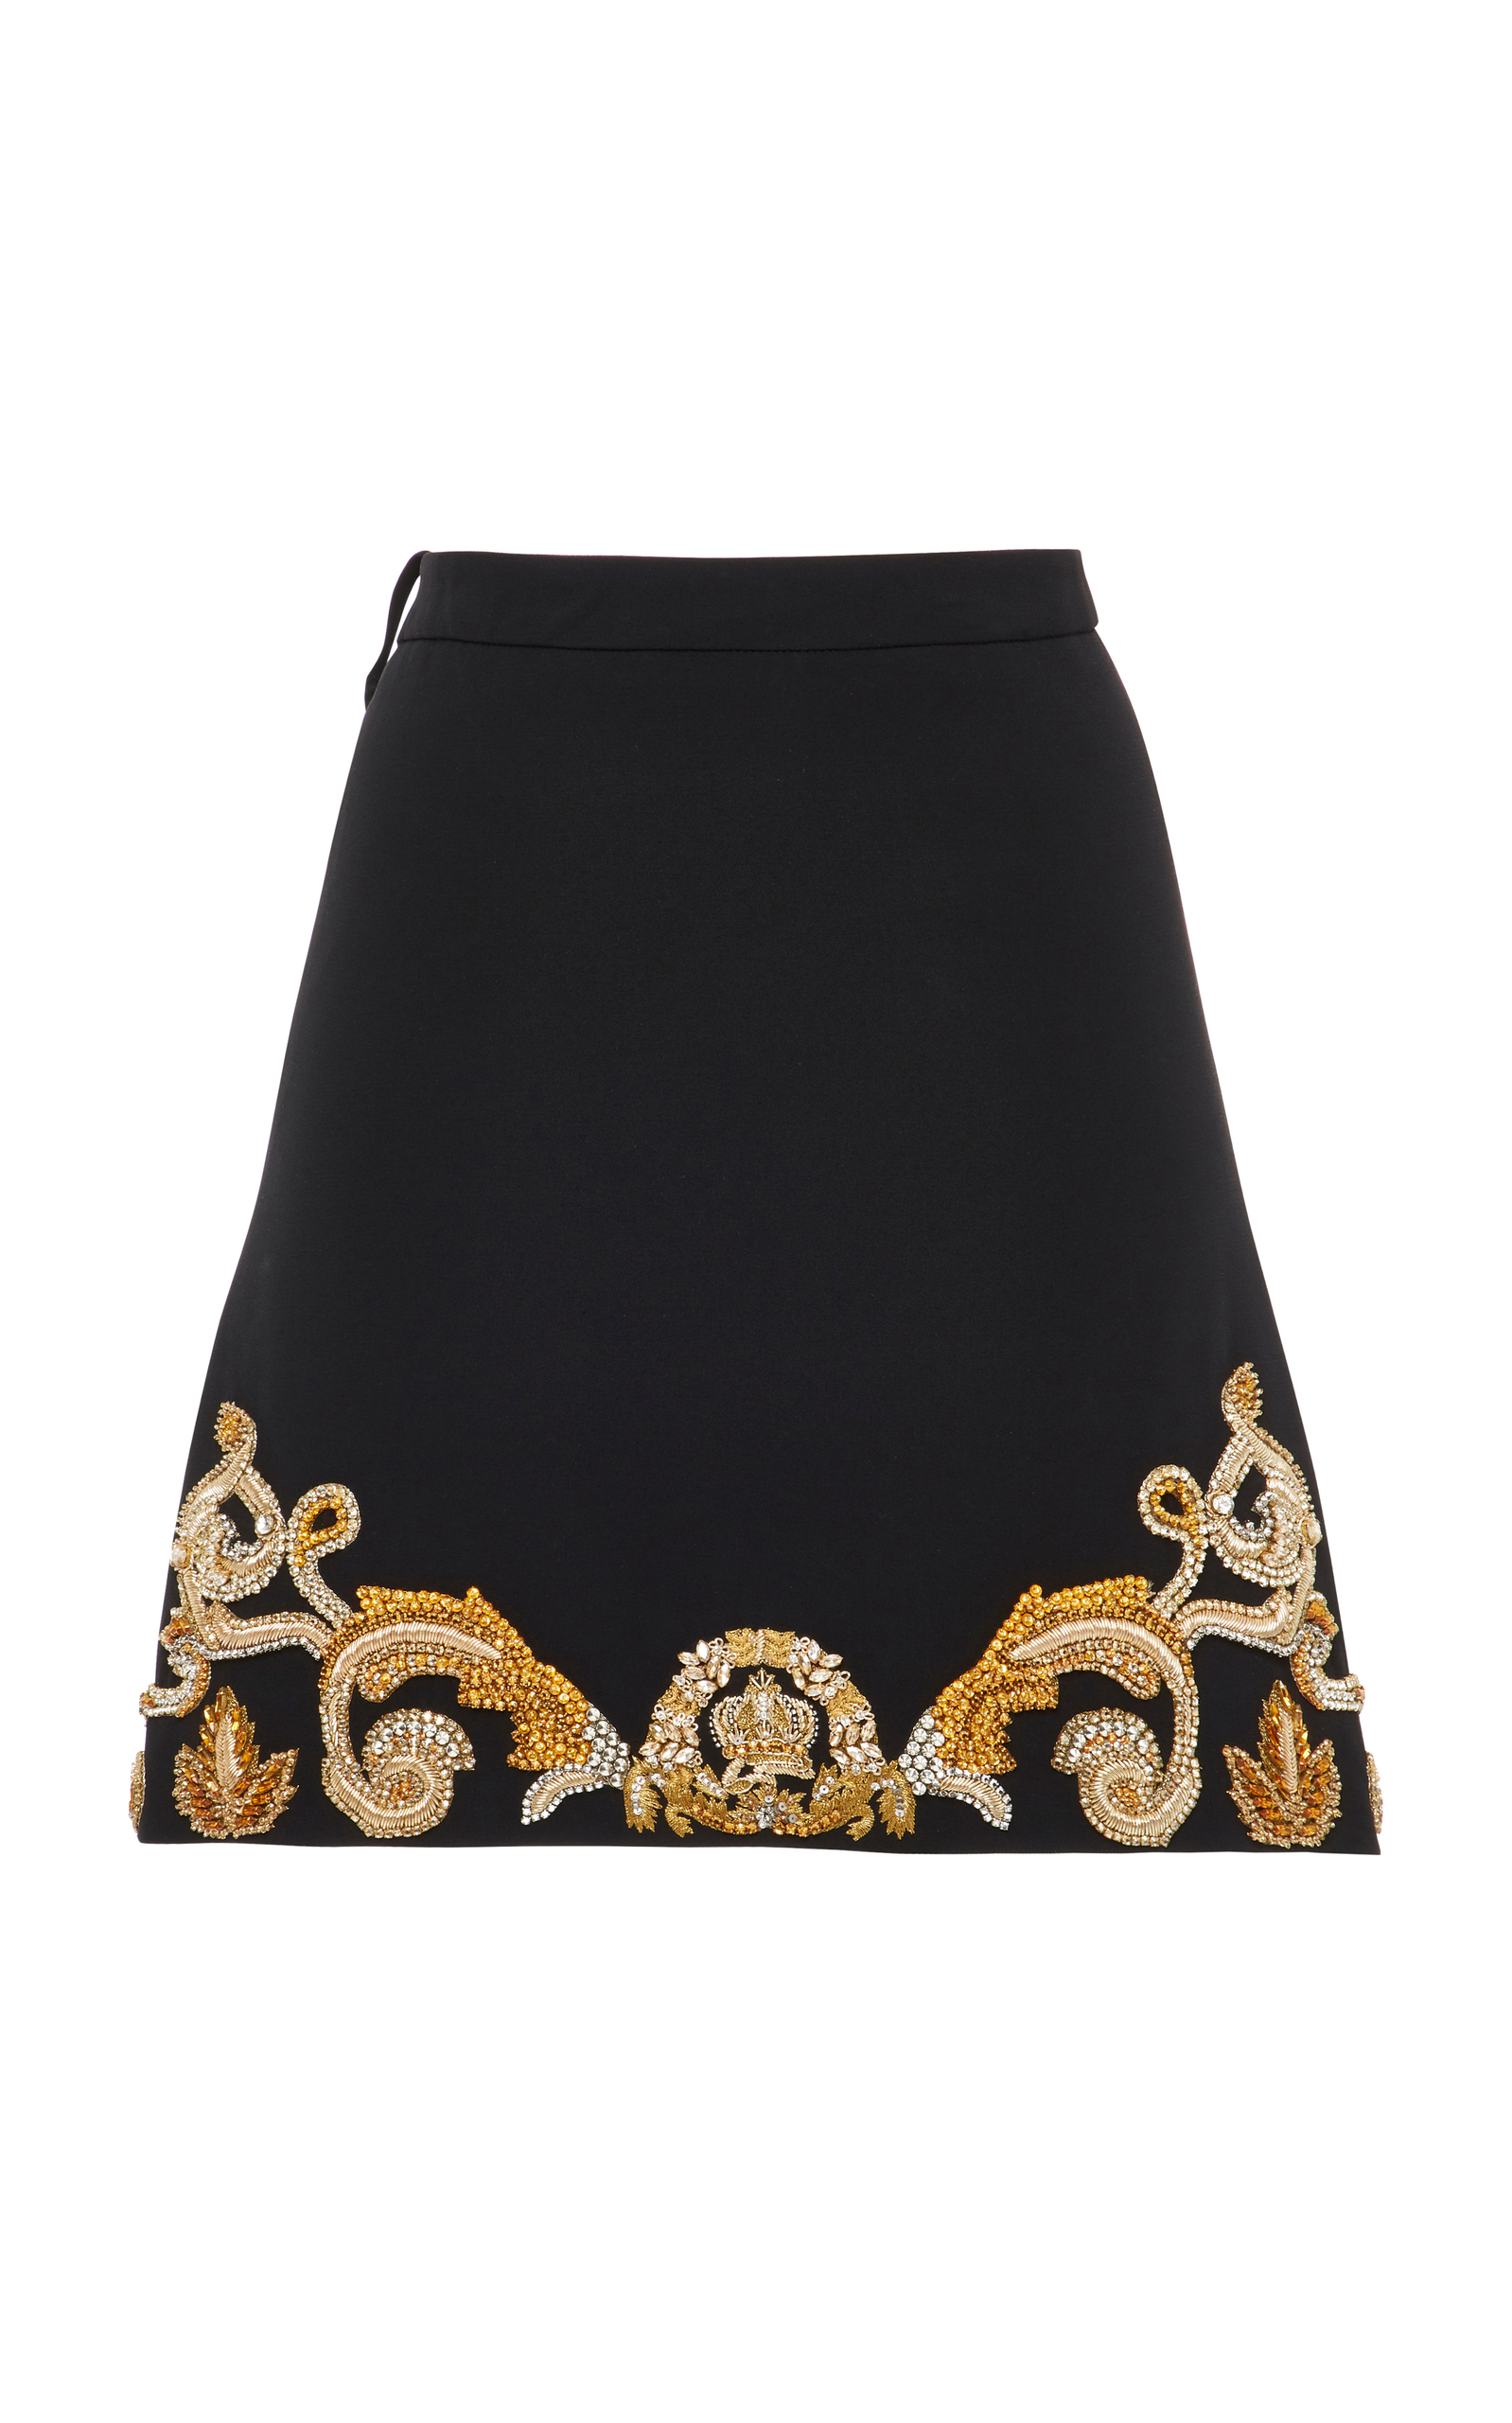 4b0c2fda Embellished Mini Skirt